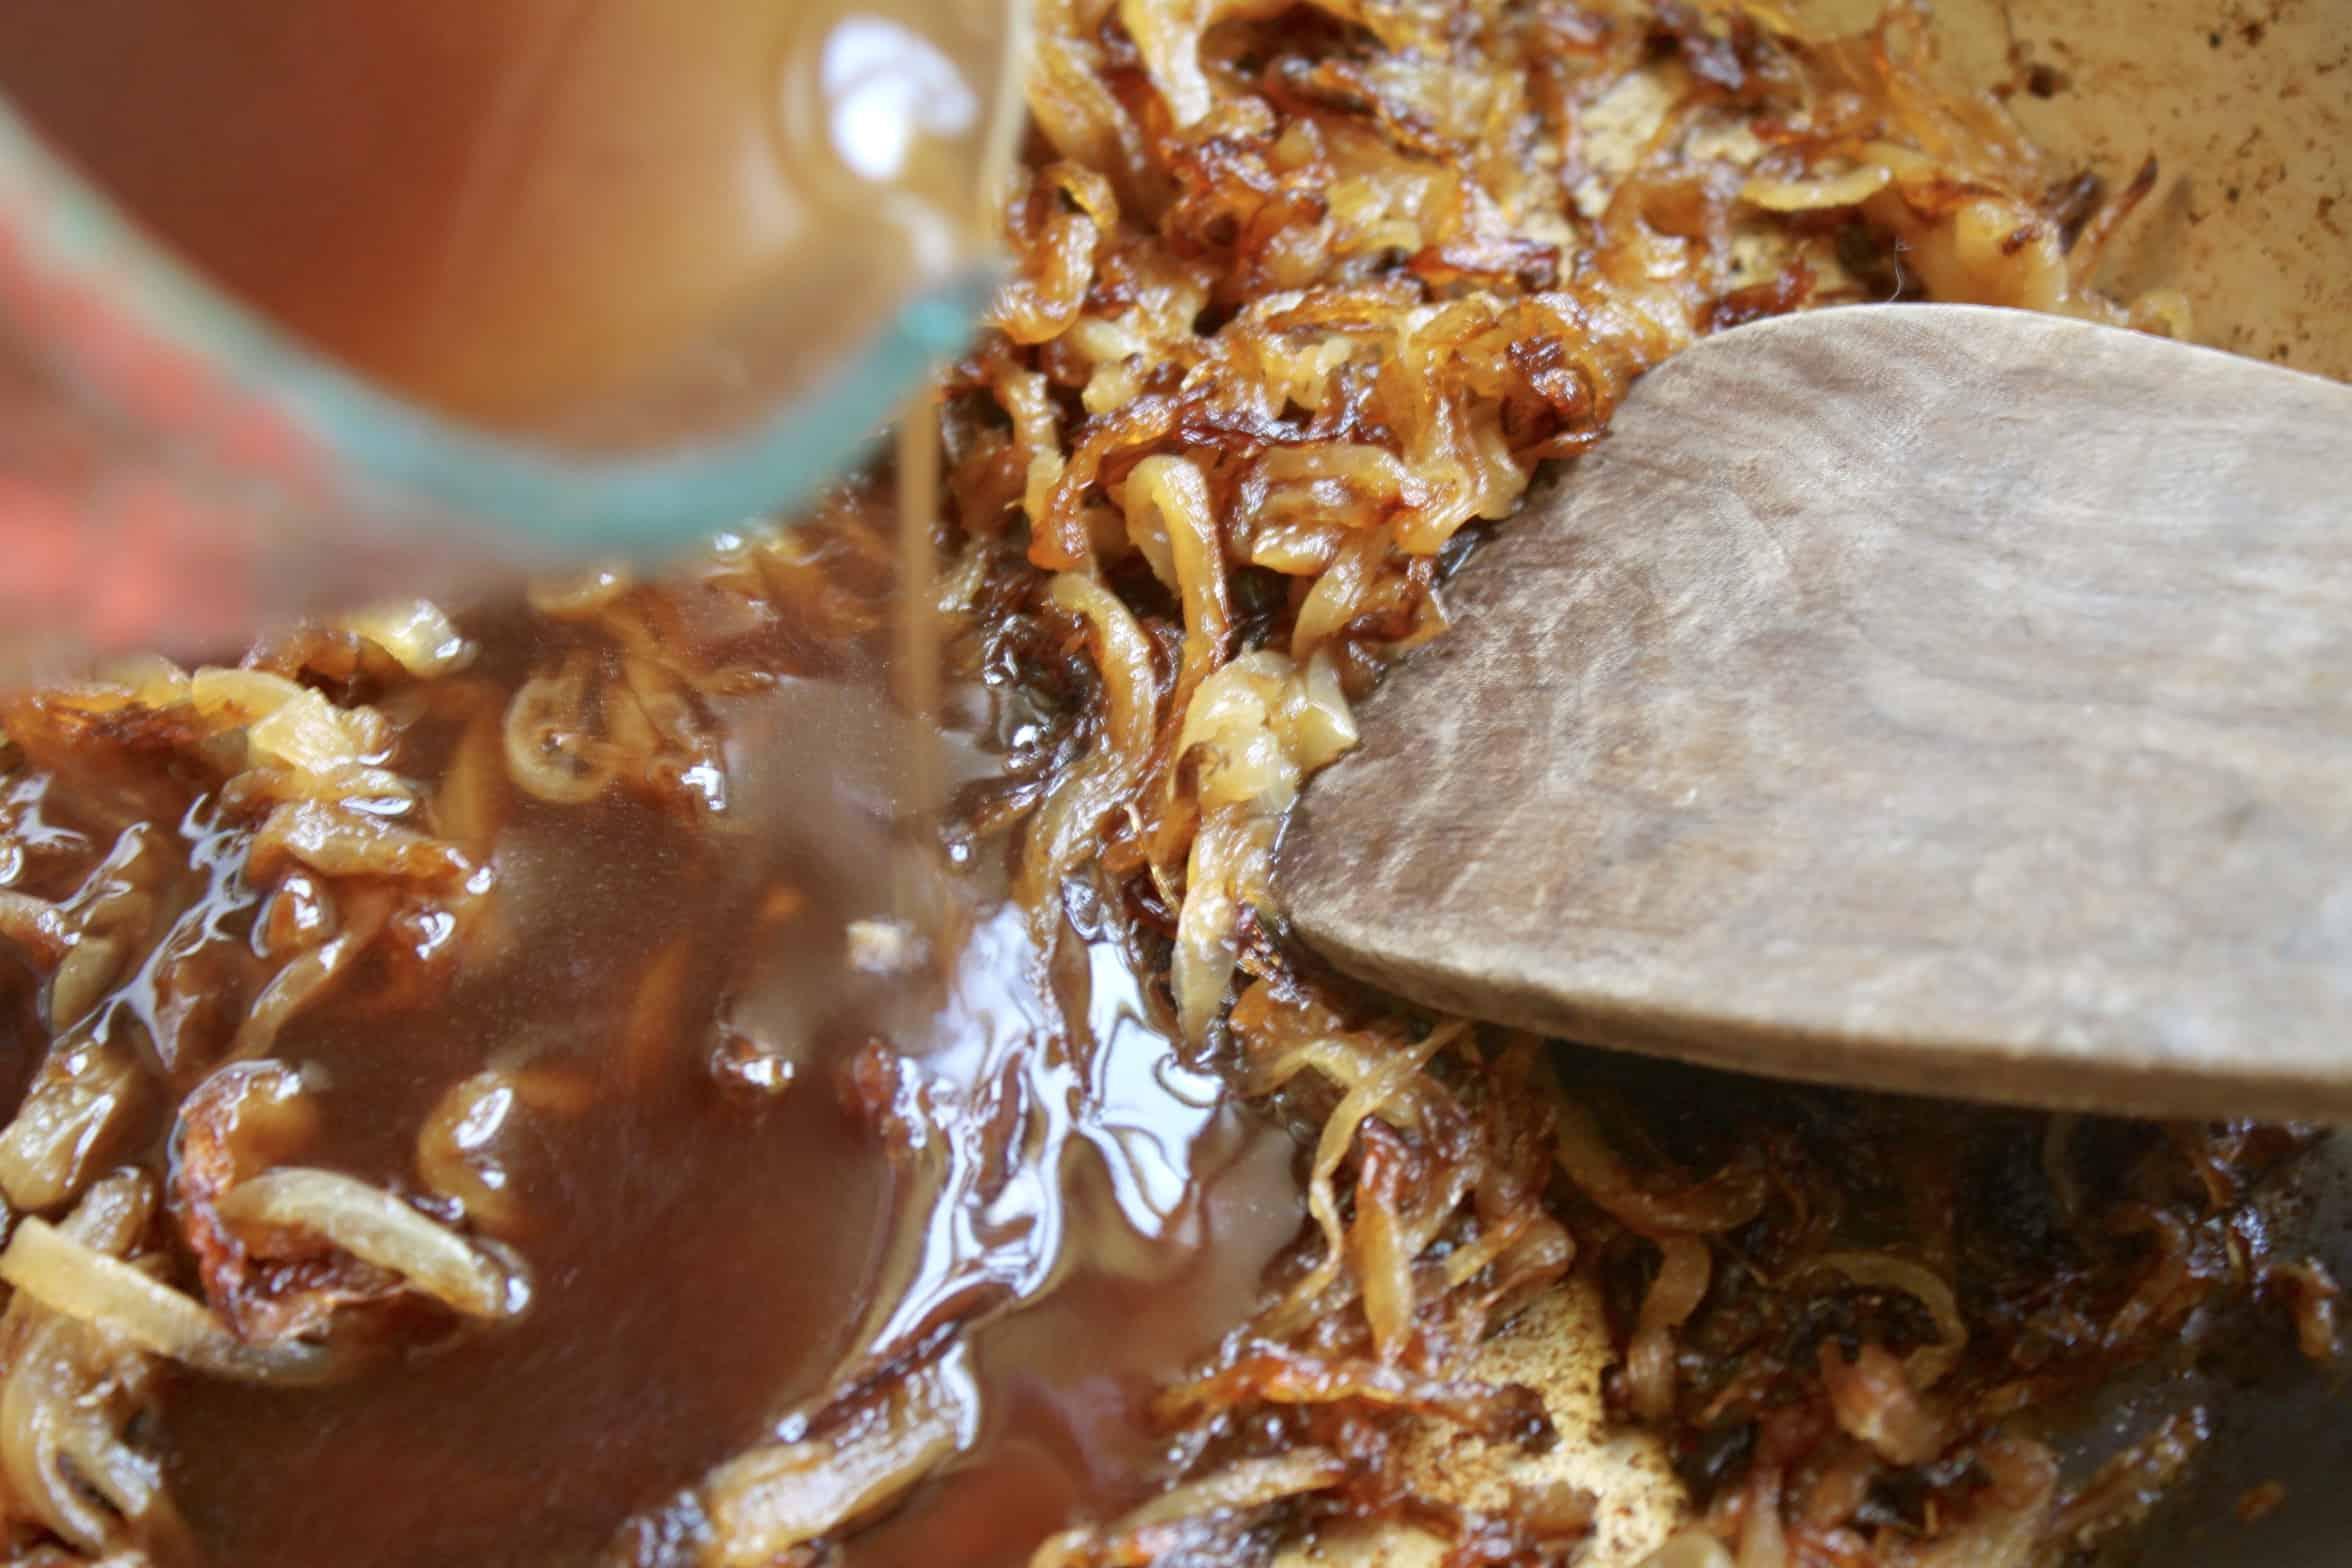 adding gravy to caramelized onions